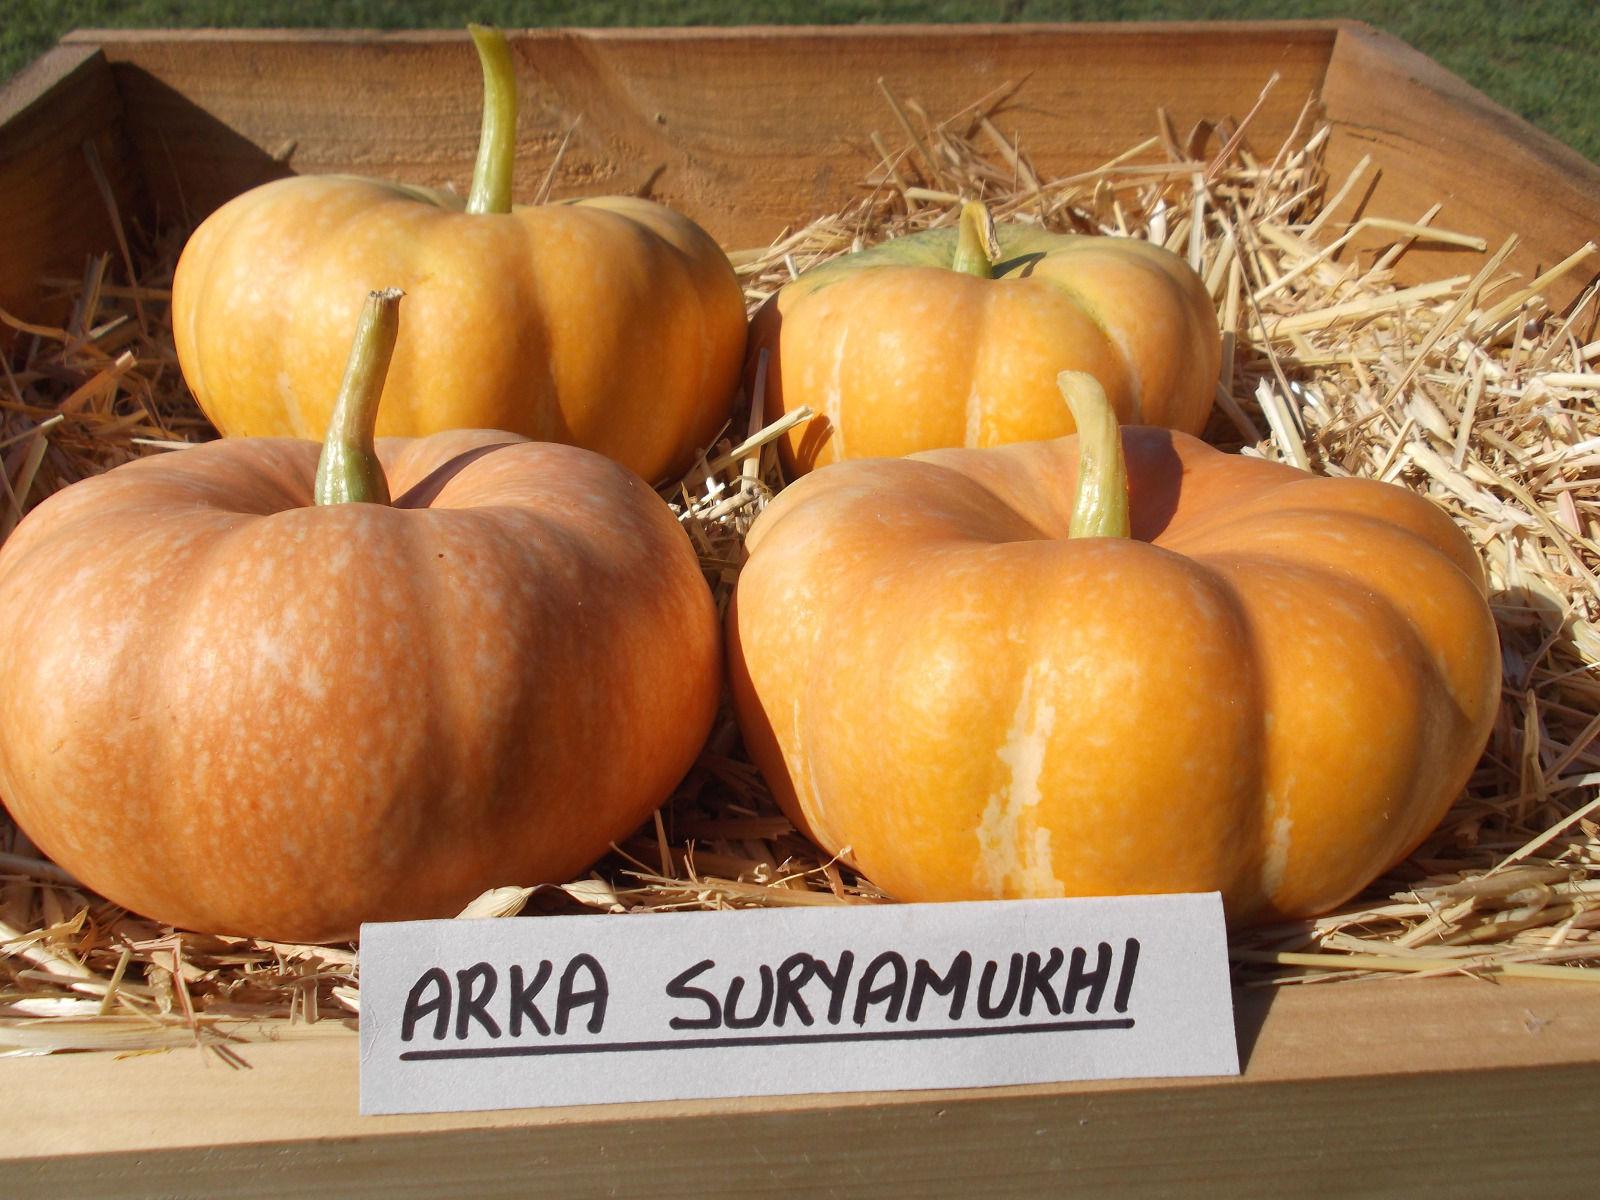 Arka Suryamukhi